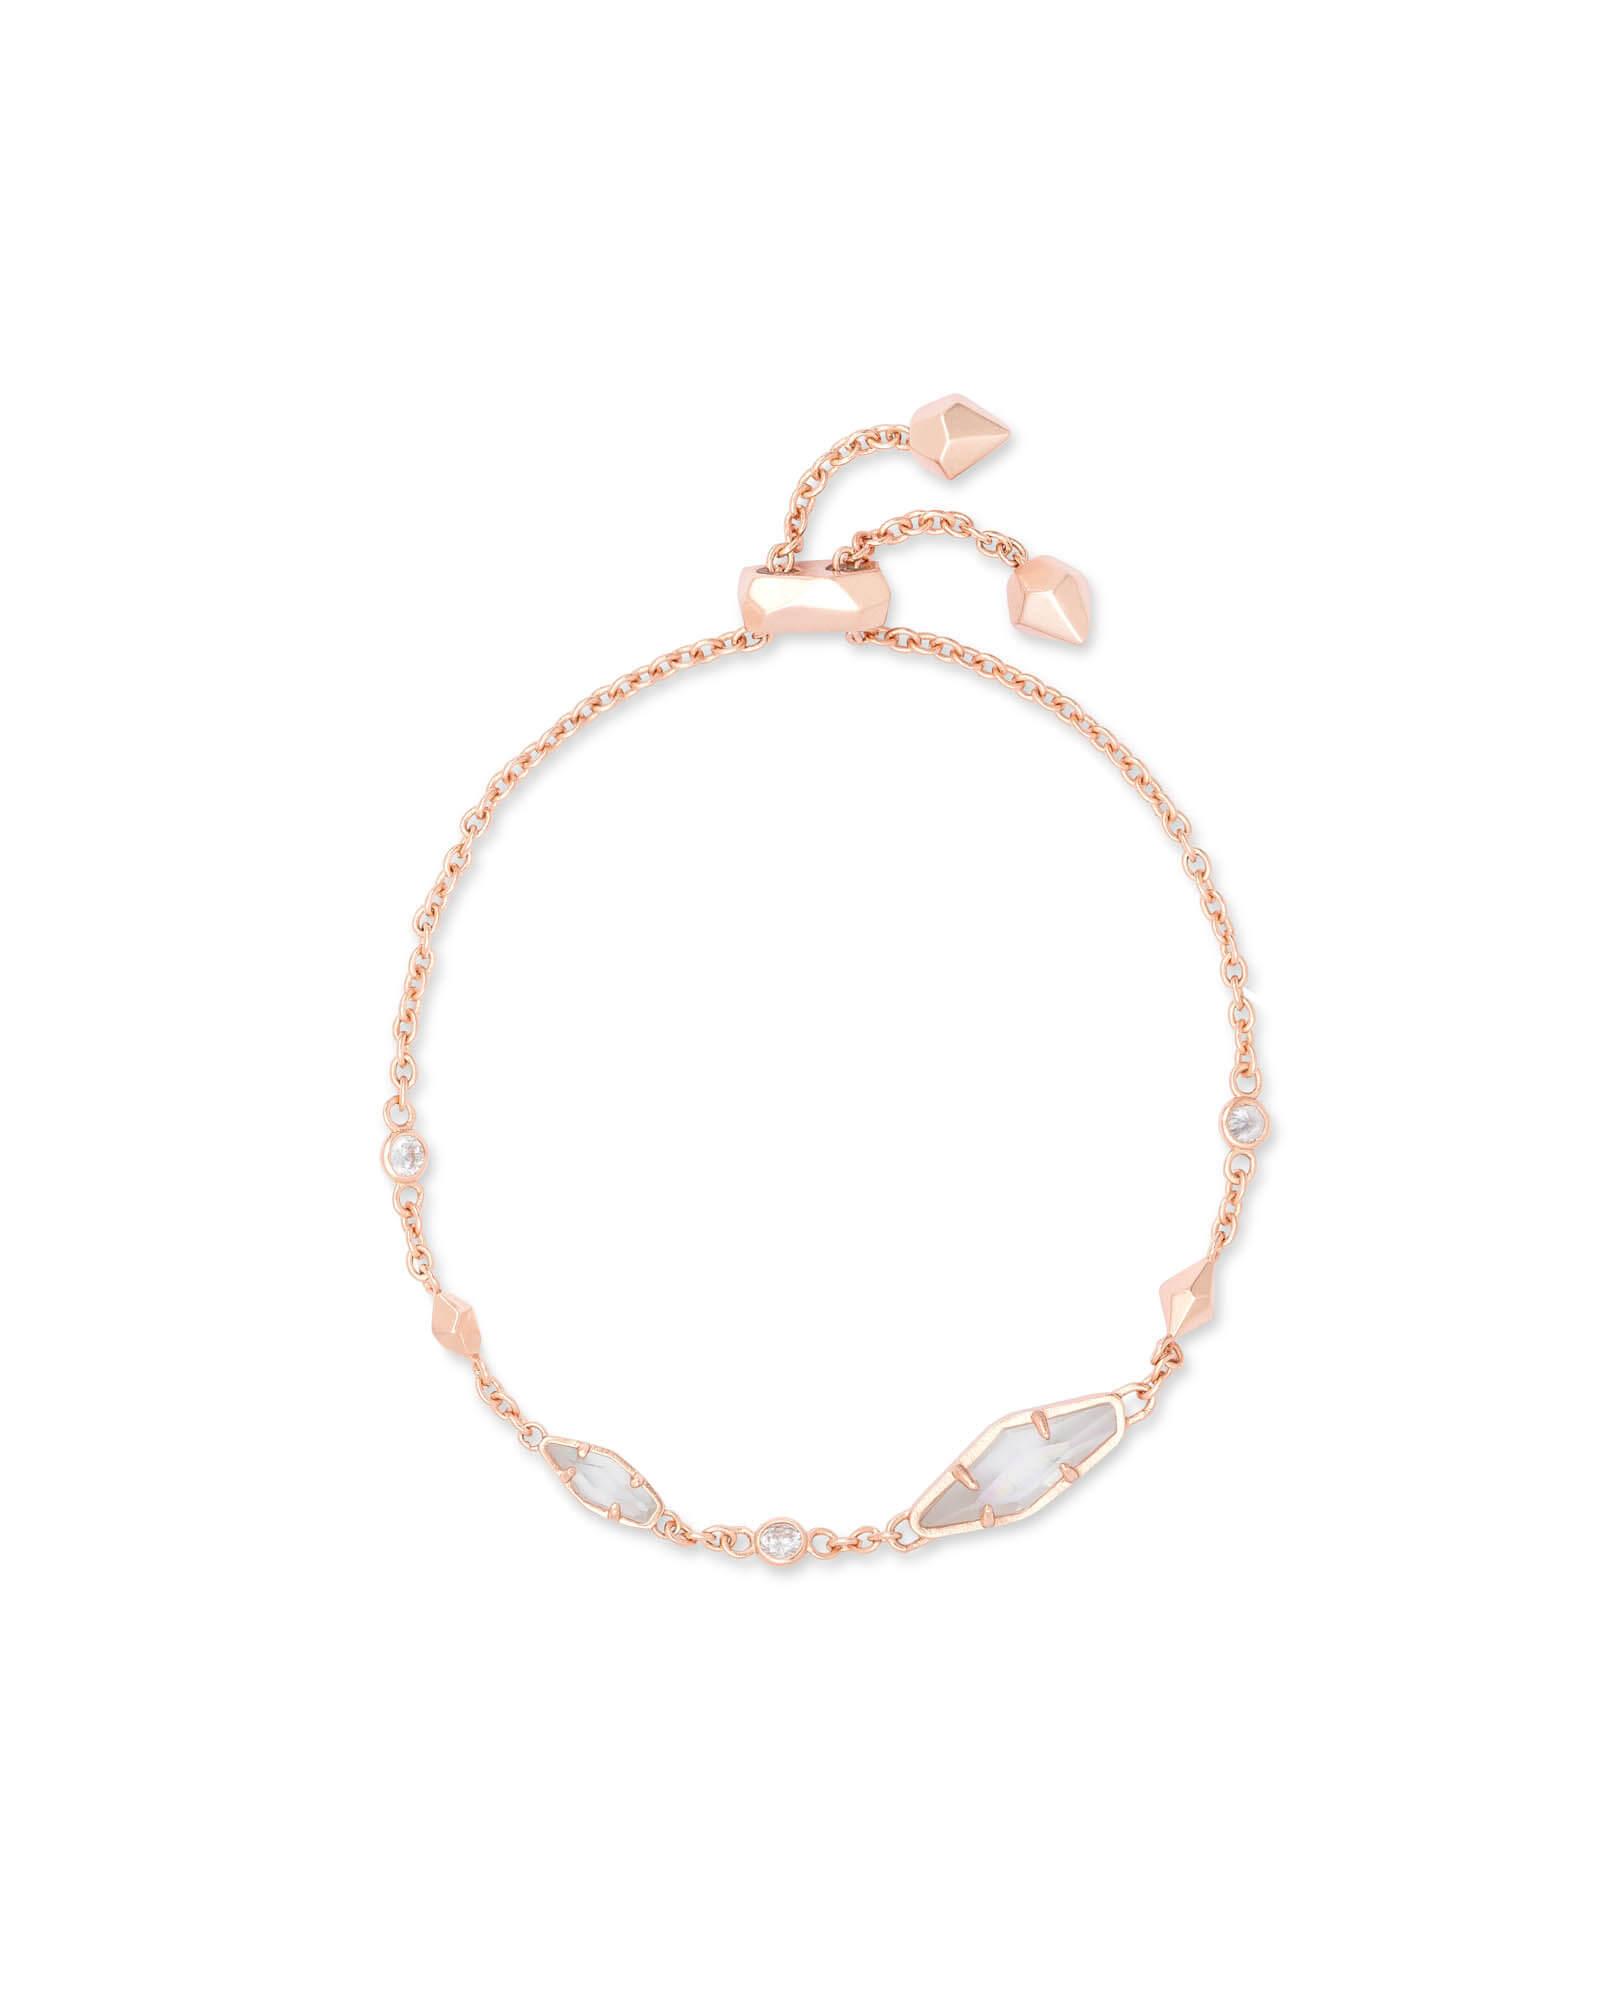 d27f56eb5e05cc Deb Adjustable Chain Bracelet In Rose Gold | Kendra Scott